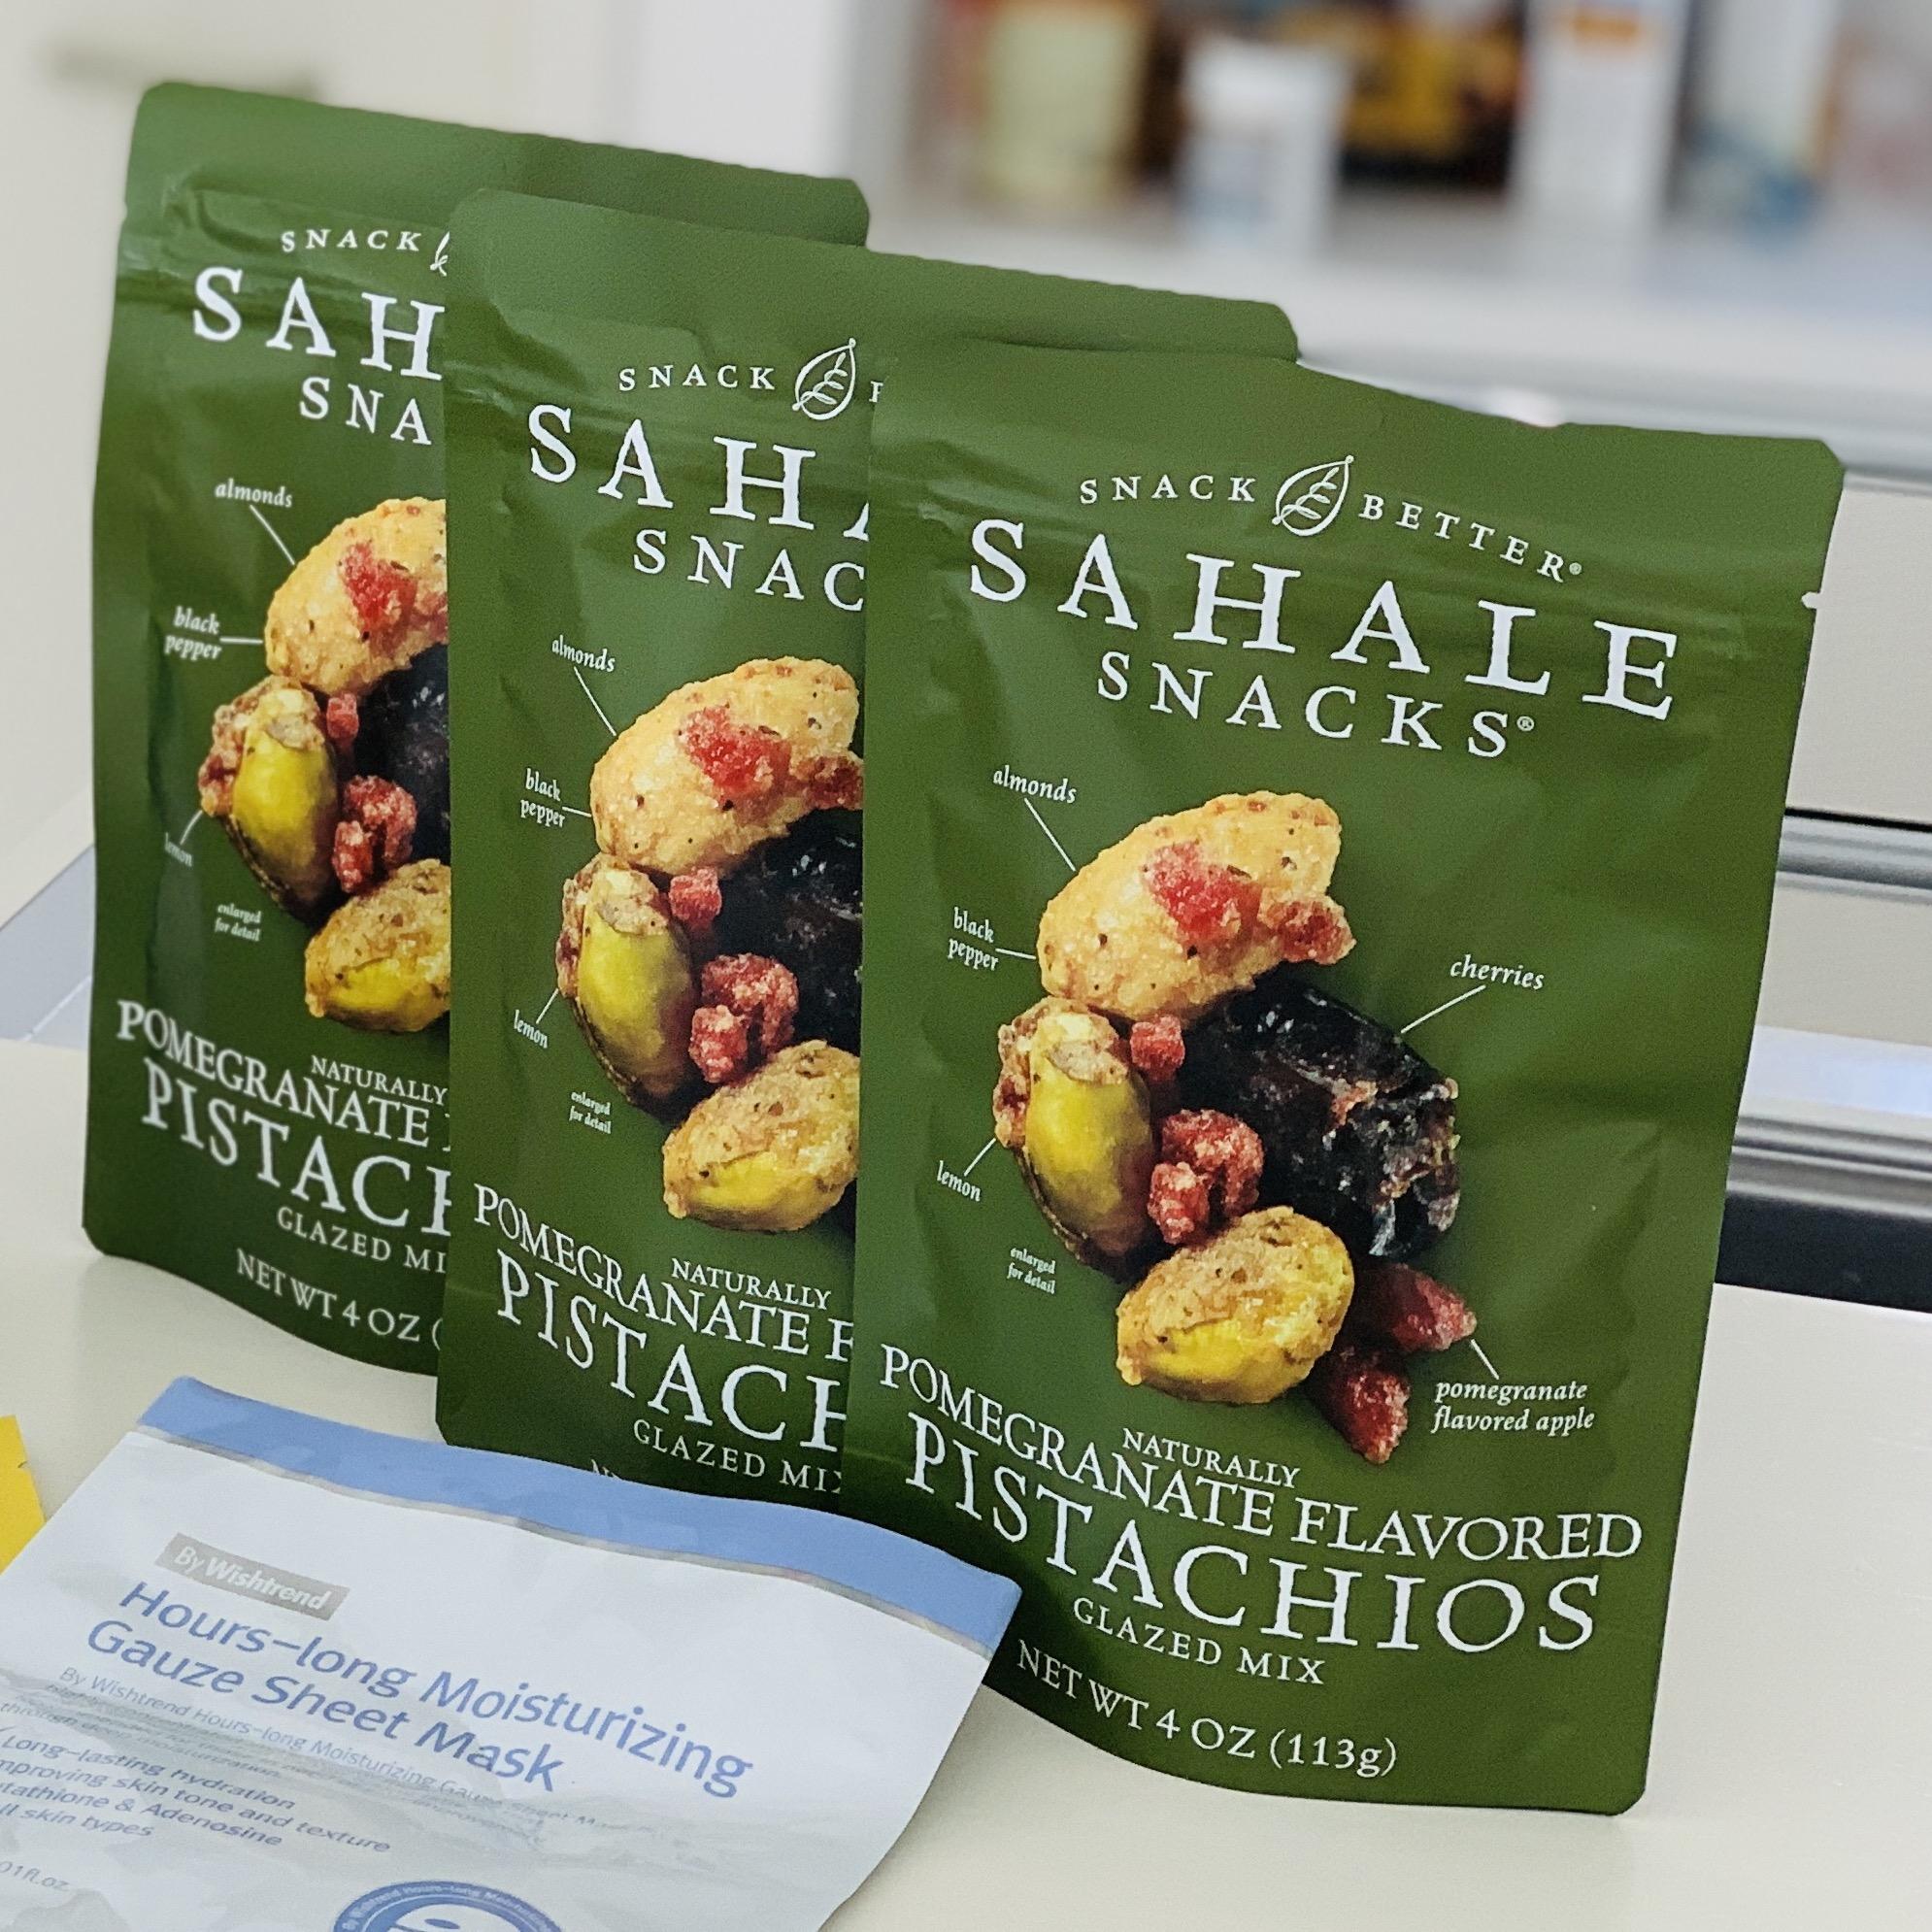 Sahale Snacks 天然ザクロ風味のピスタチ